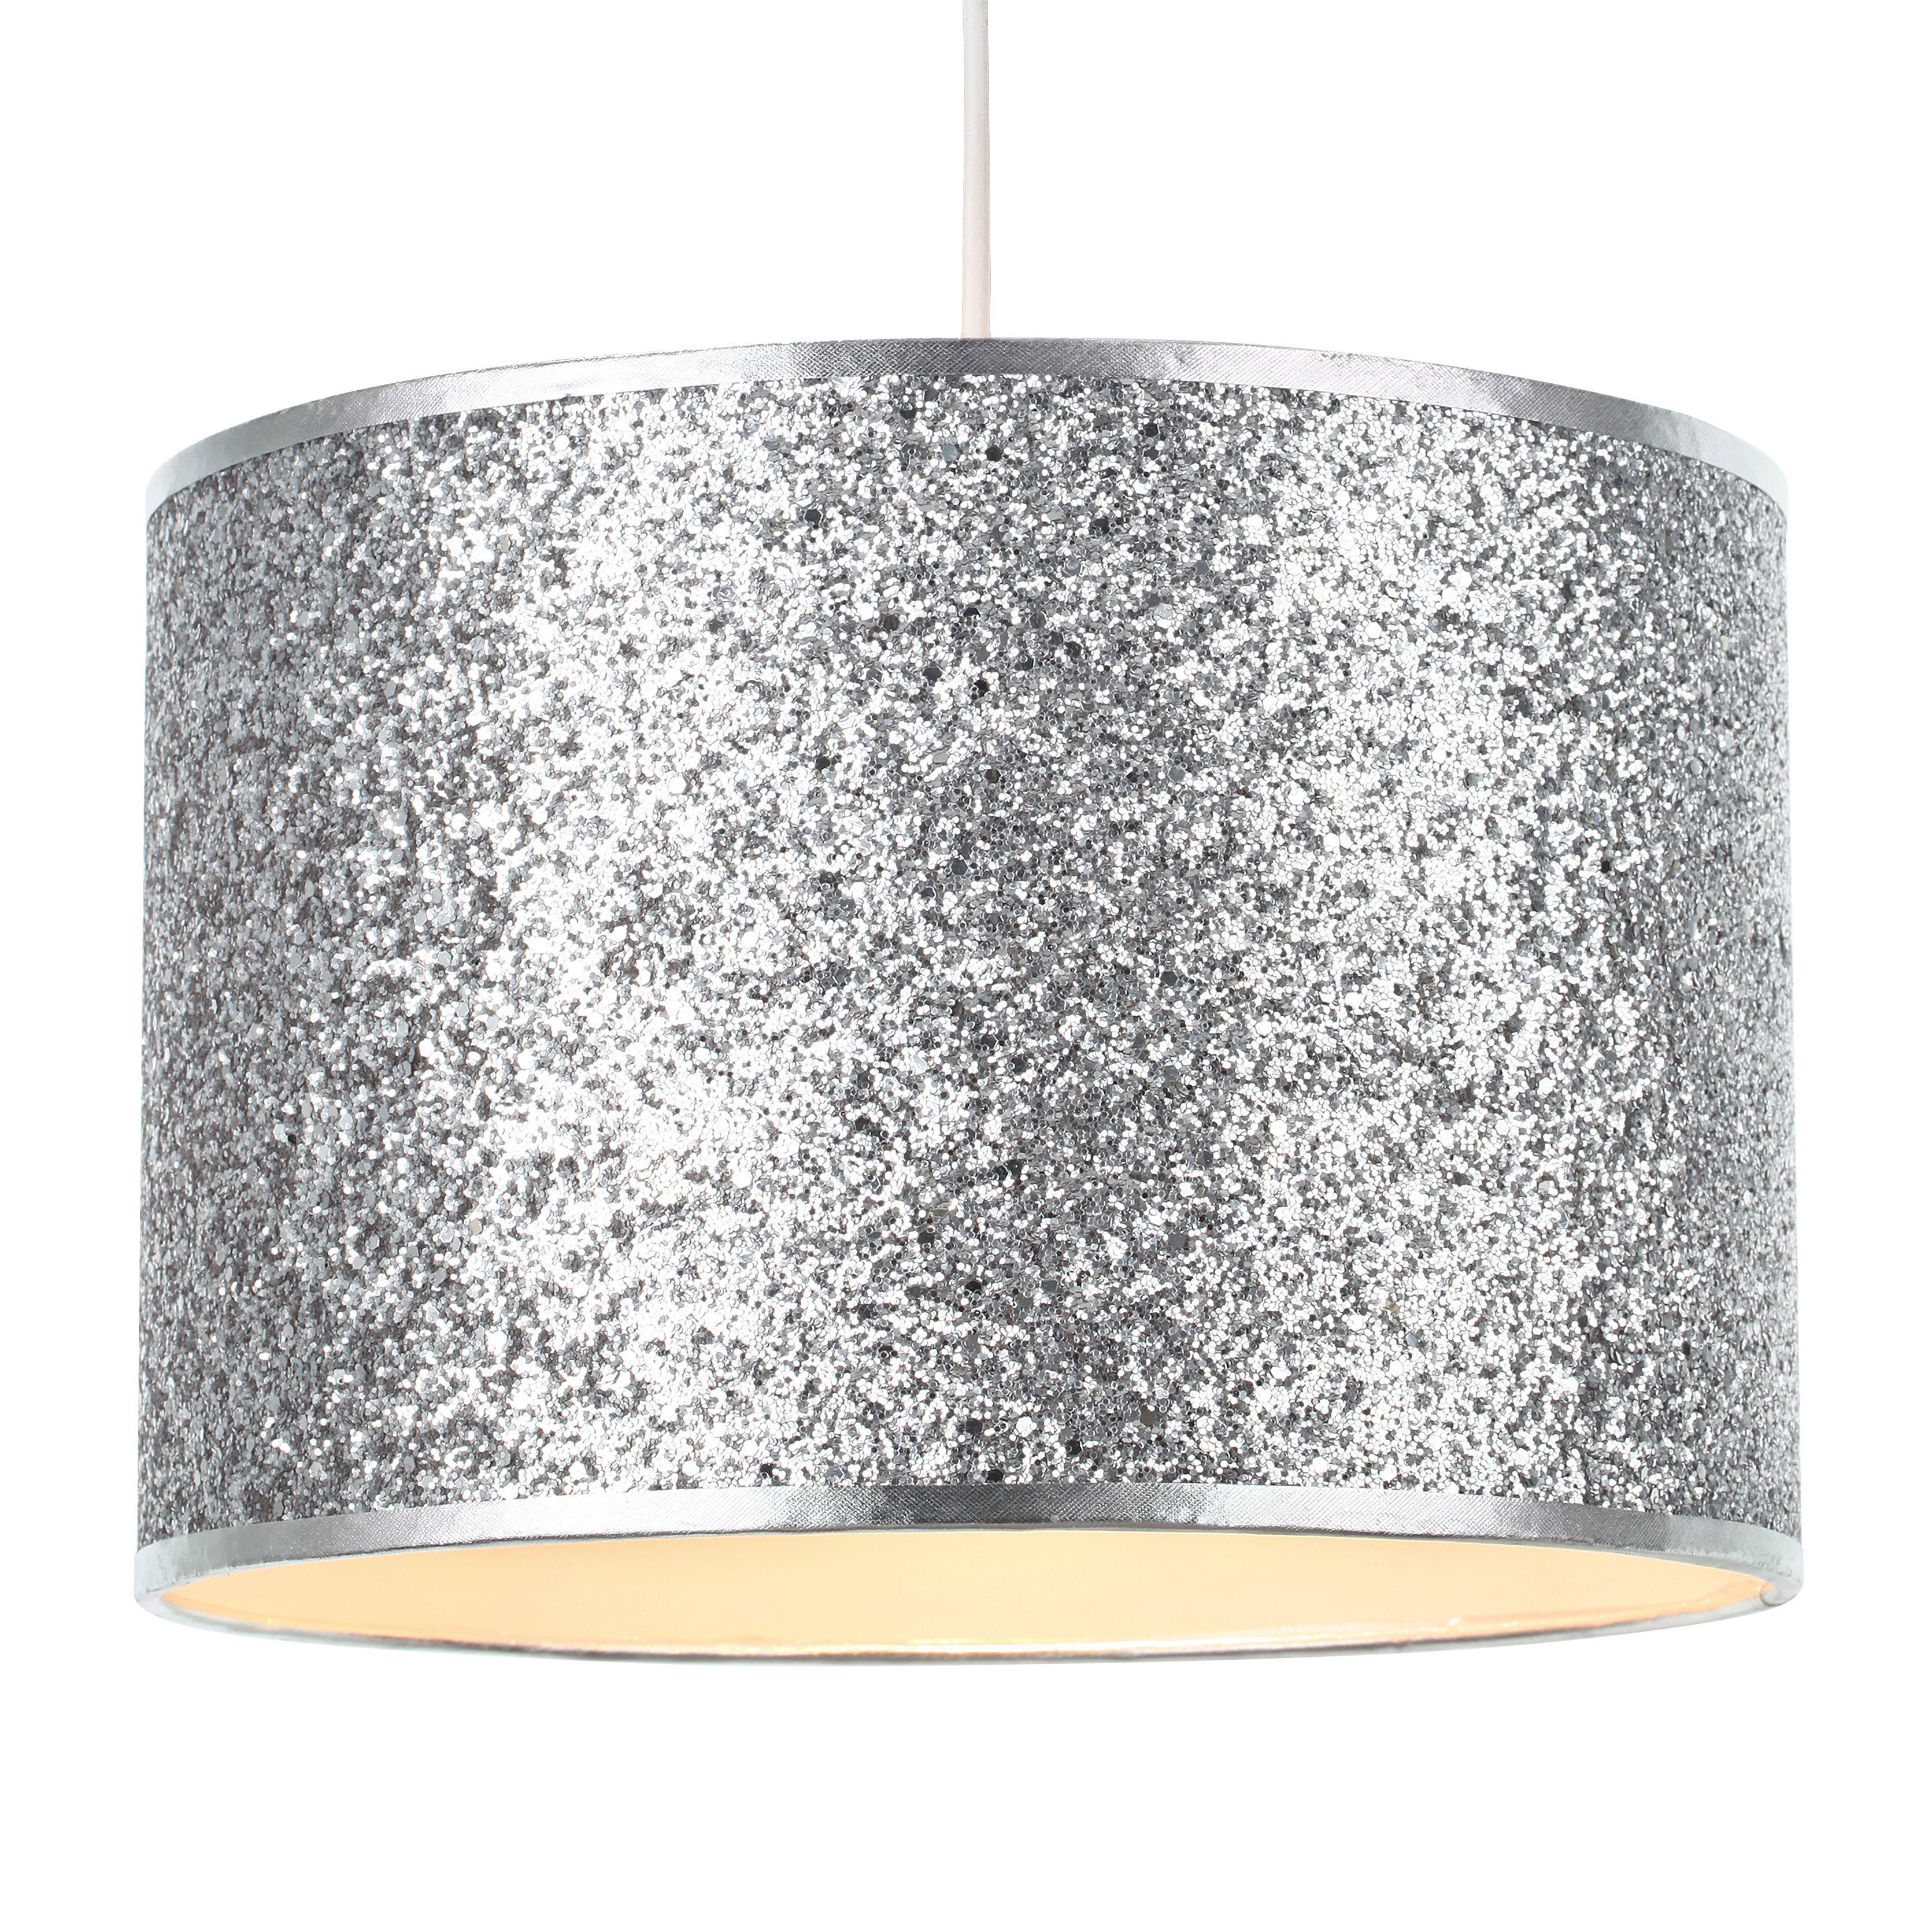 Colours Cirocha Glitter Light Shade (D)280mm | Light shades ...